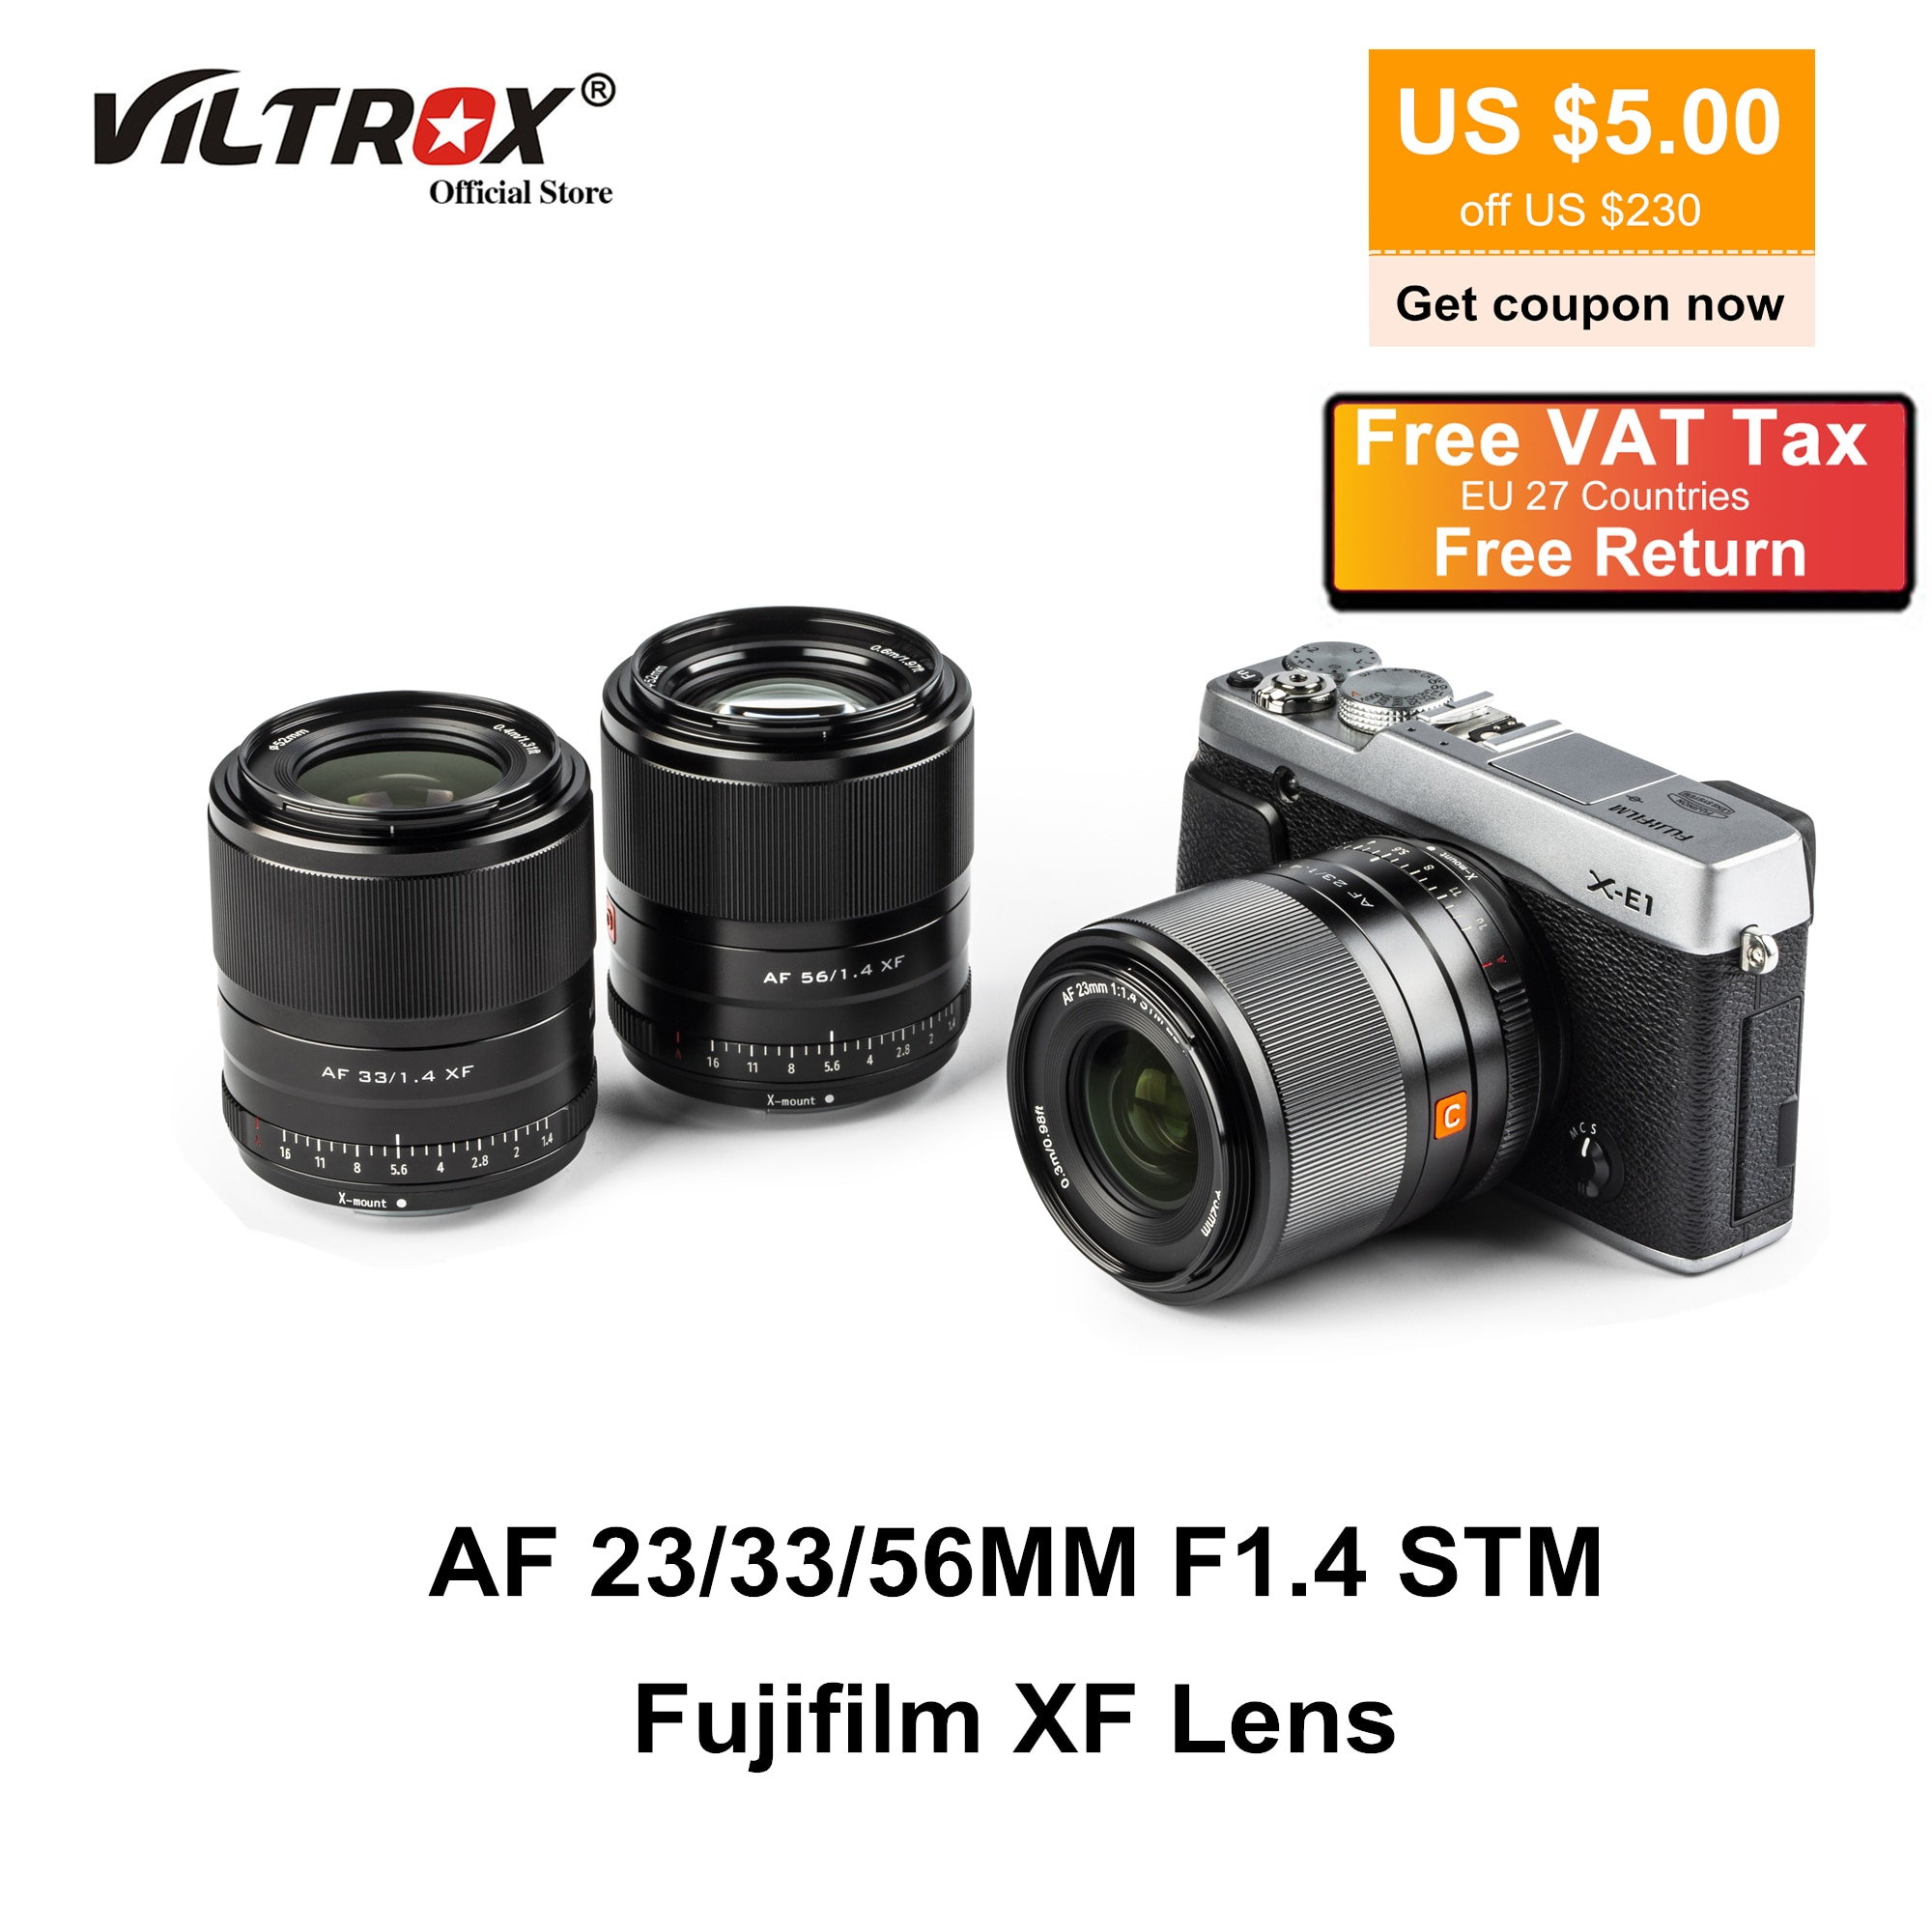 Viltrox 23mm 33mm 56mm F1.4 XF Lens التركيز التلقائي Prime فتحة عدسة كبيرة عدسات بزاوية عريضة لـ Fujifilm Fuji X Mount Camera Lens X-T4 X-T30